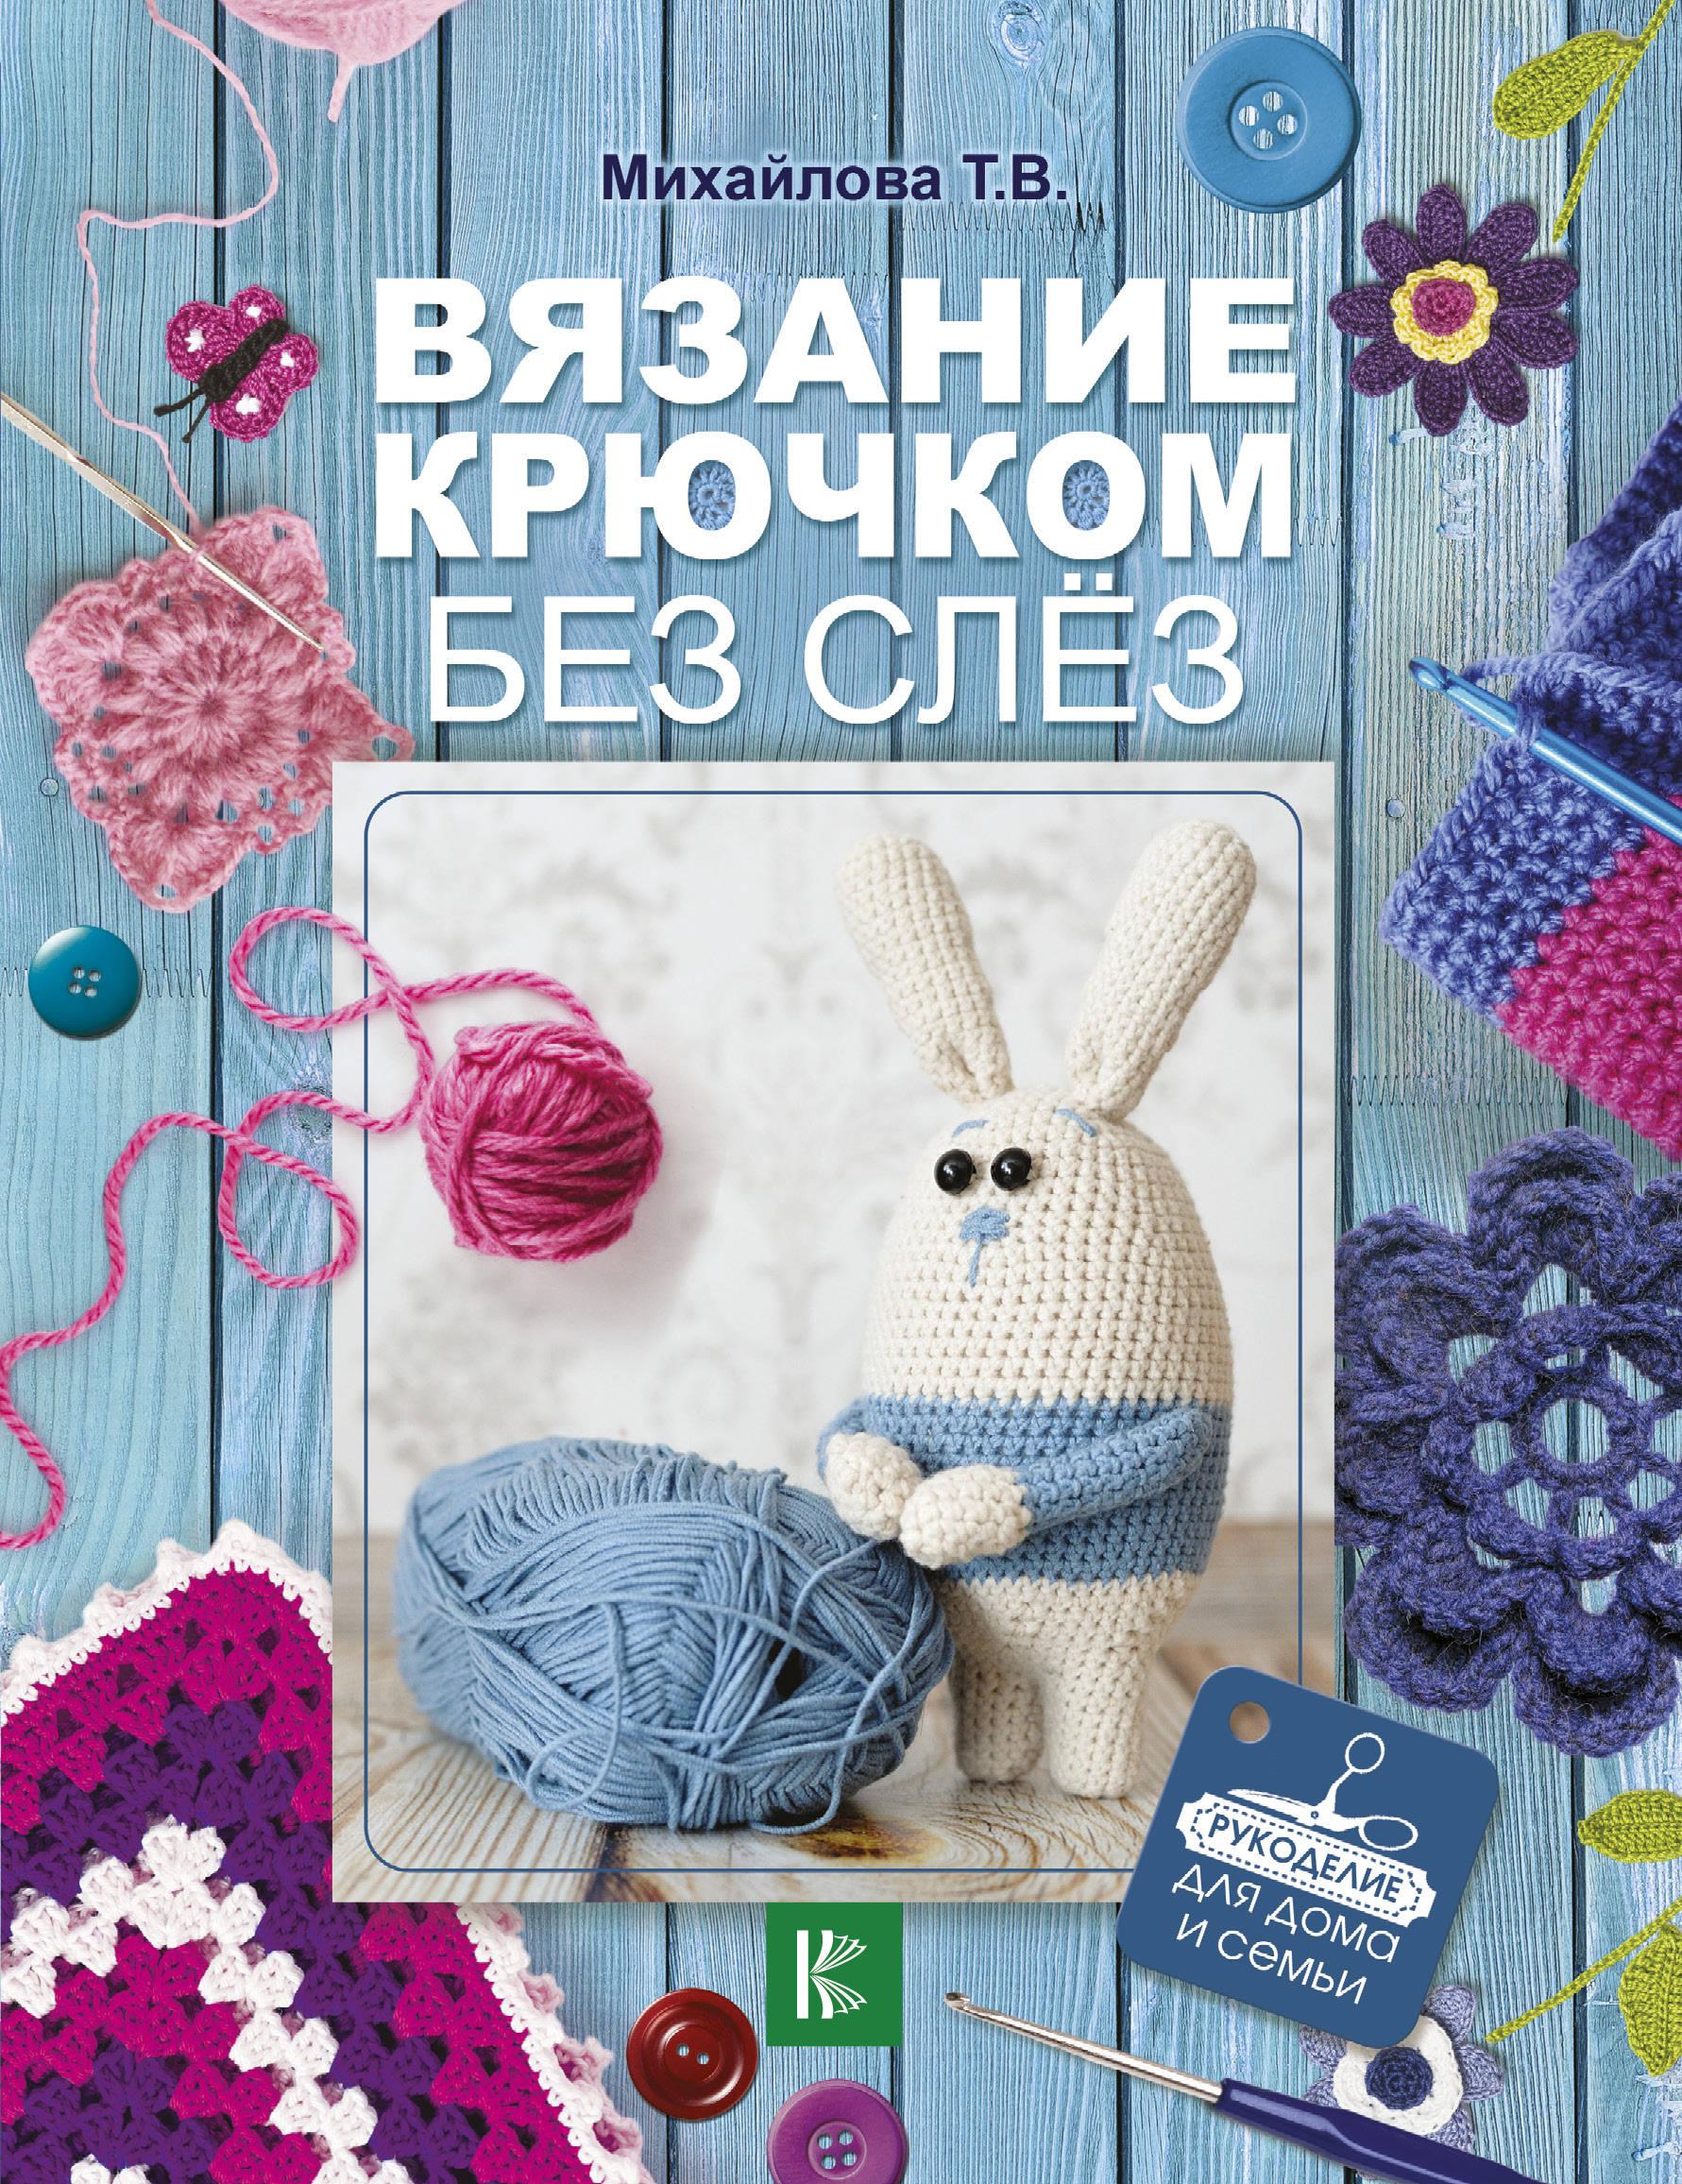 Михайлова Т.В. Вязание крючком без слёз